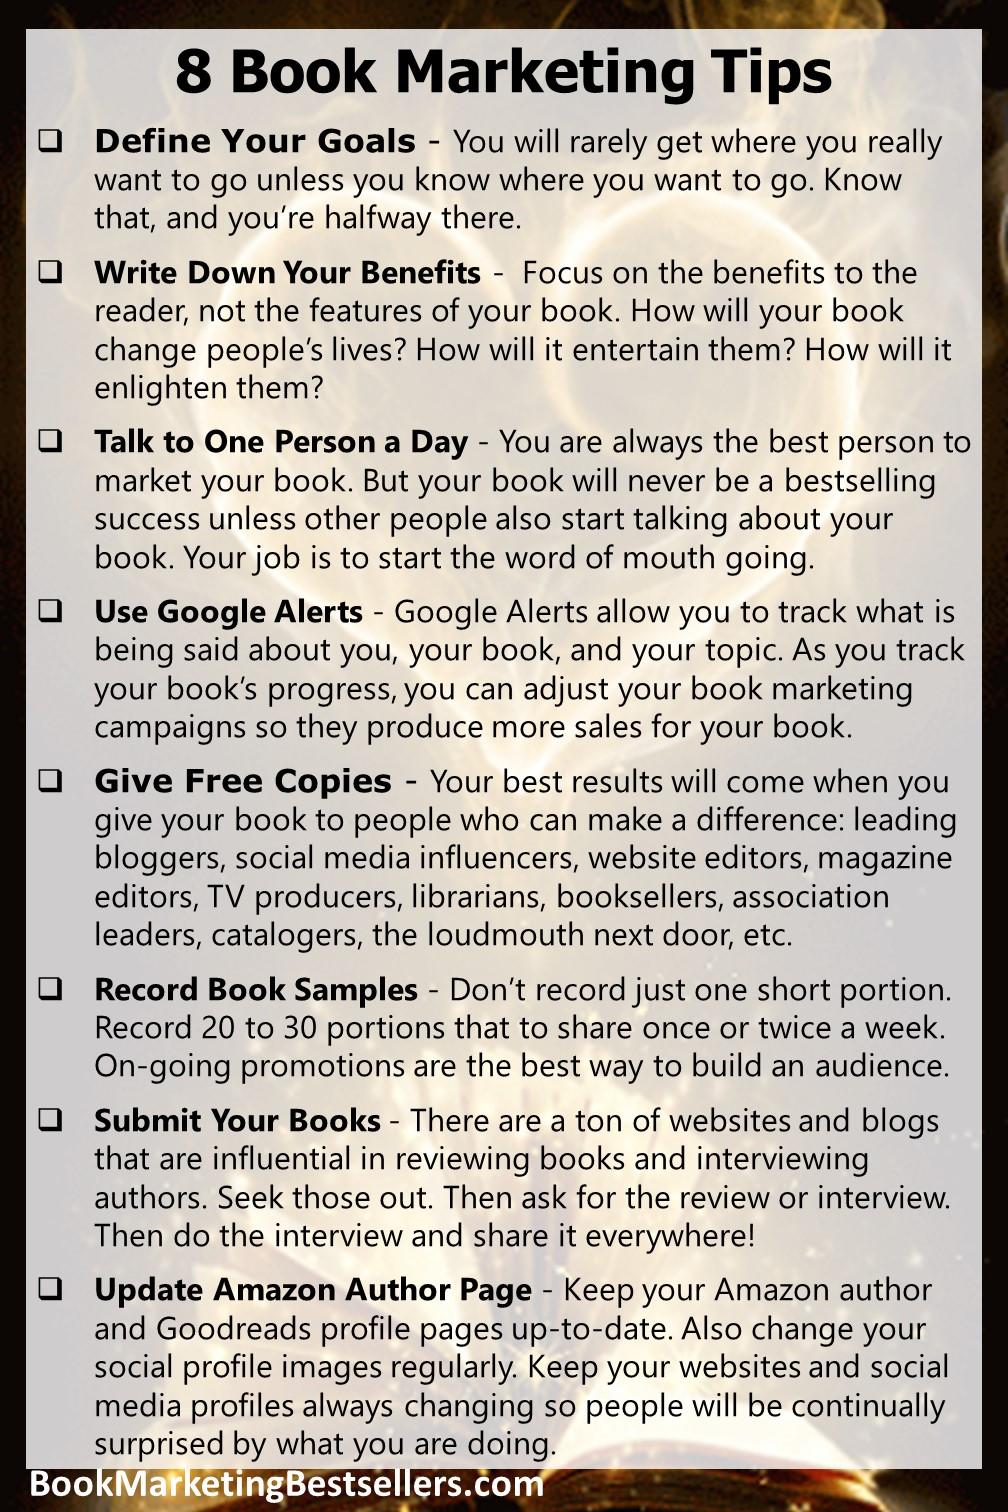 8 Book Marketing Tips